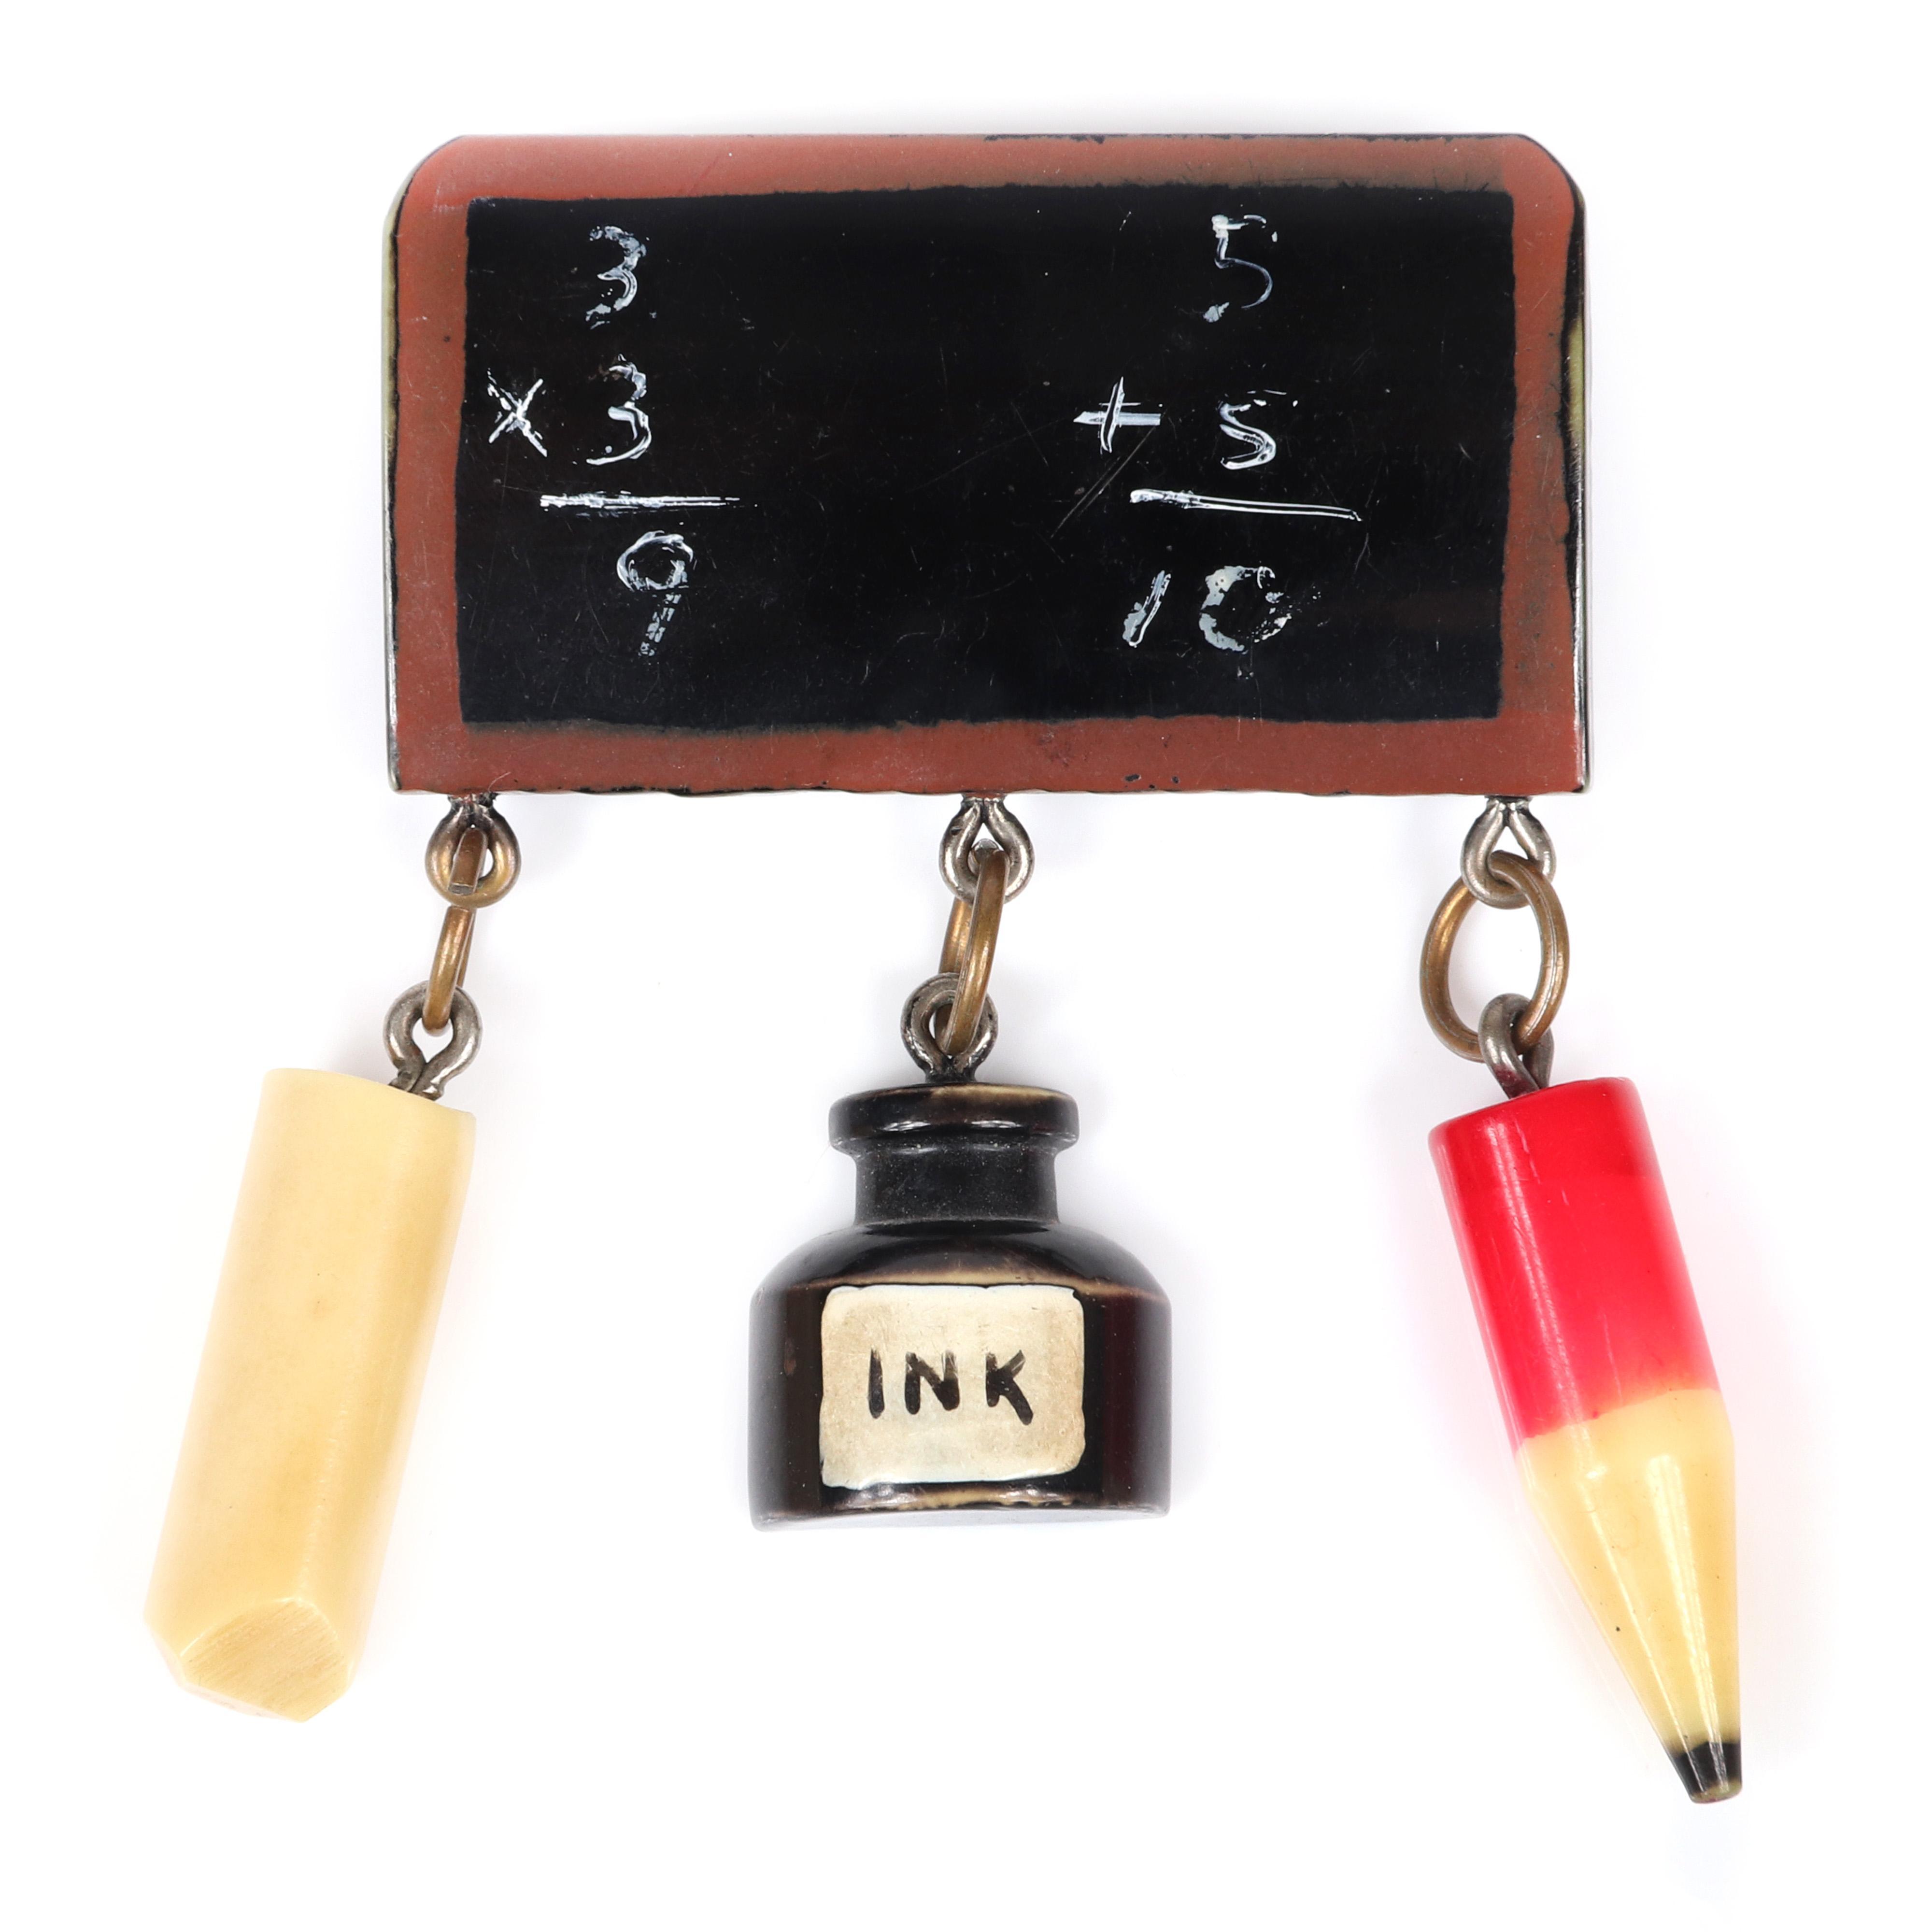 "Vintage Martha Sleeper? Bakelite ""School Days"" chalkboard pin brooch with chalk, ink and pencil charms. 2 3/4""H x 2""W"